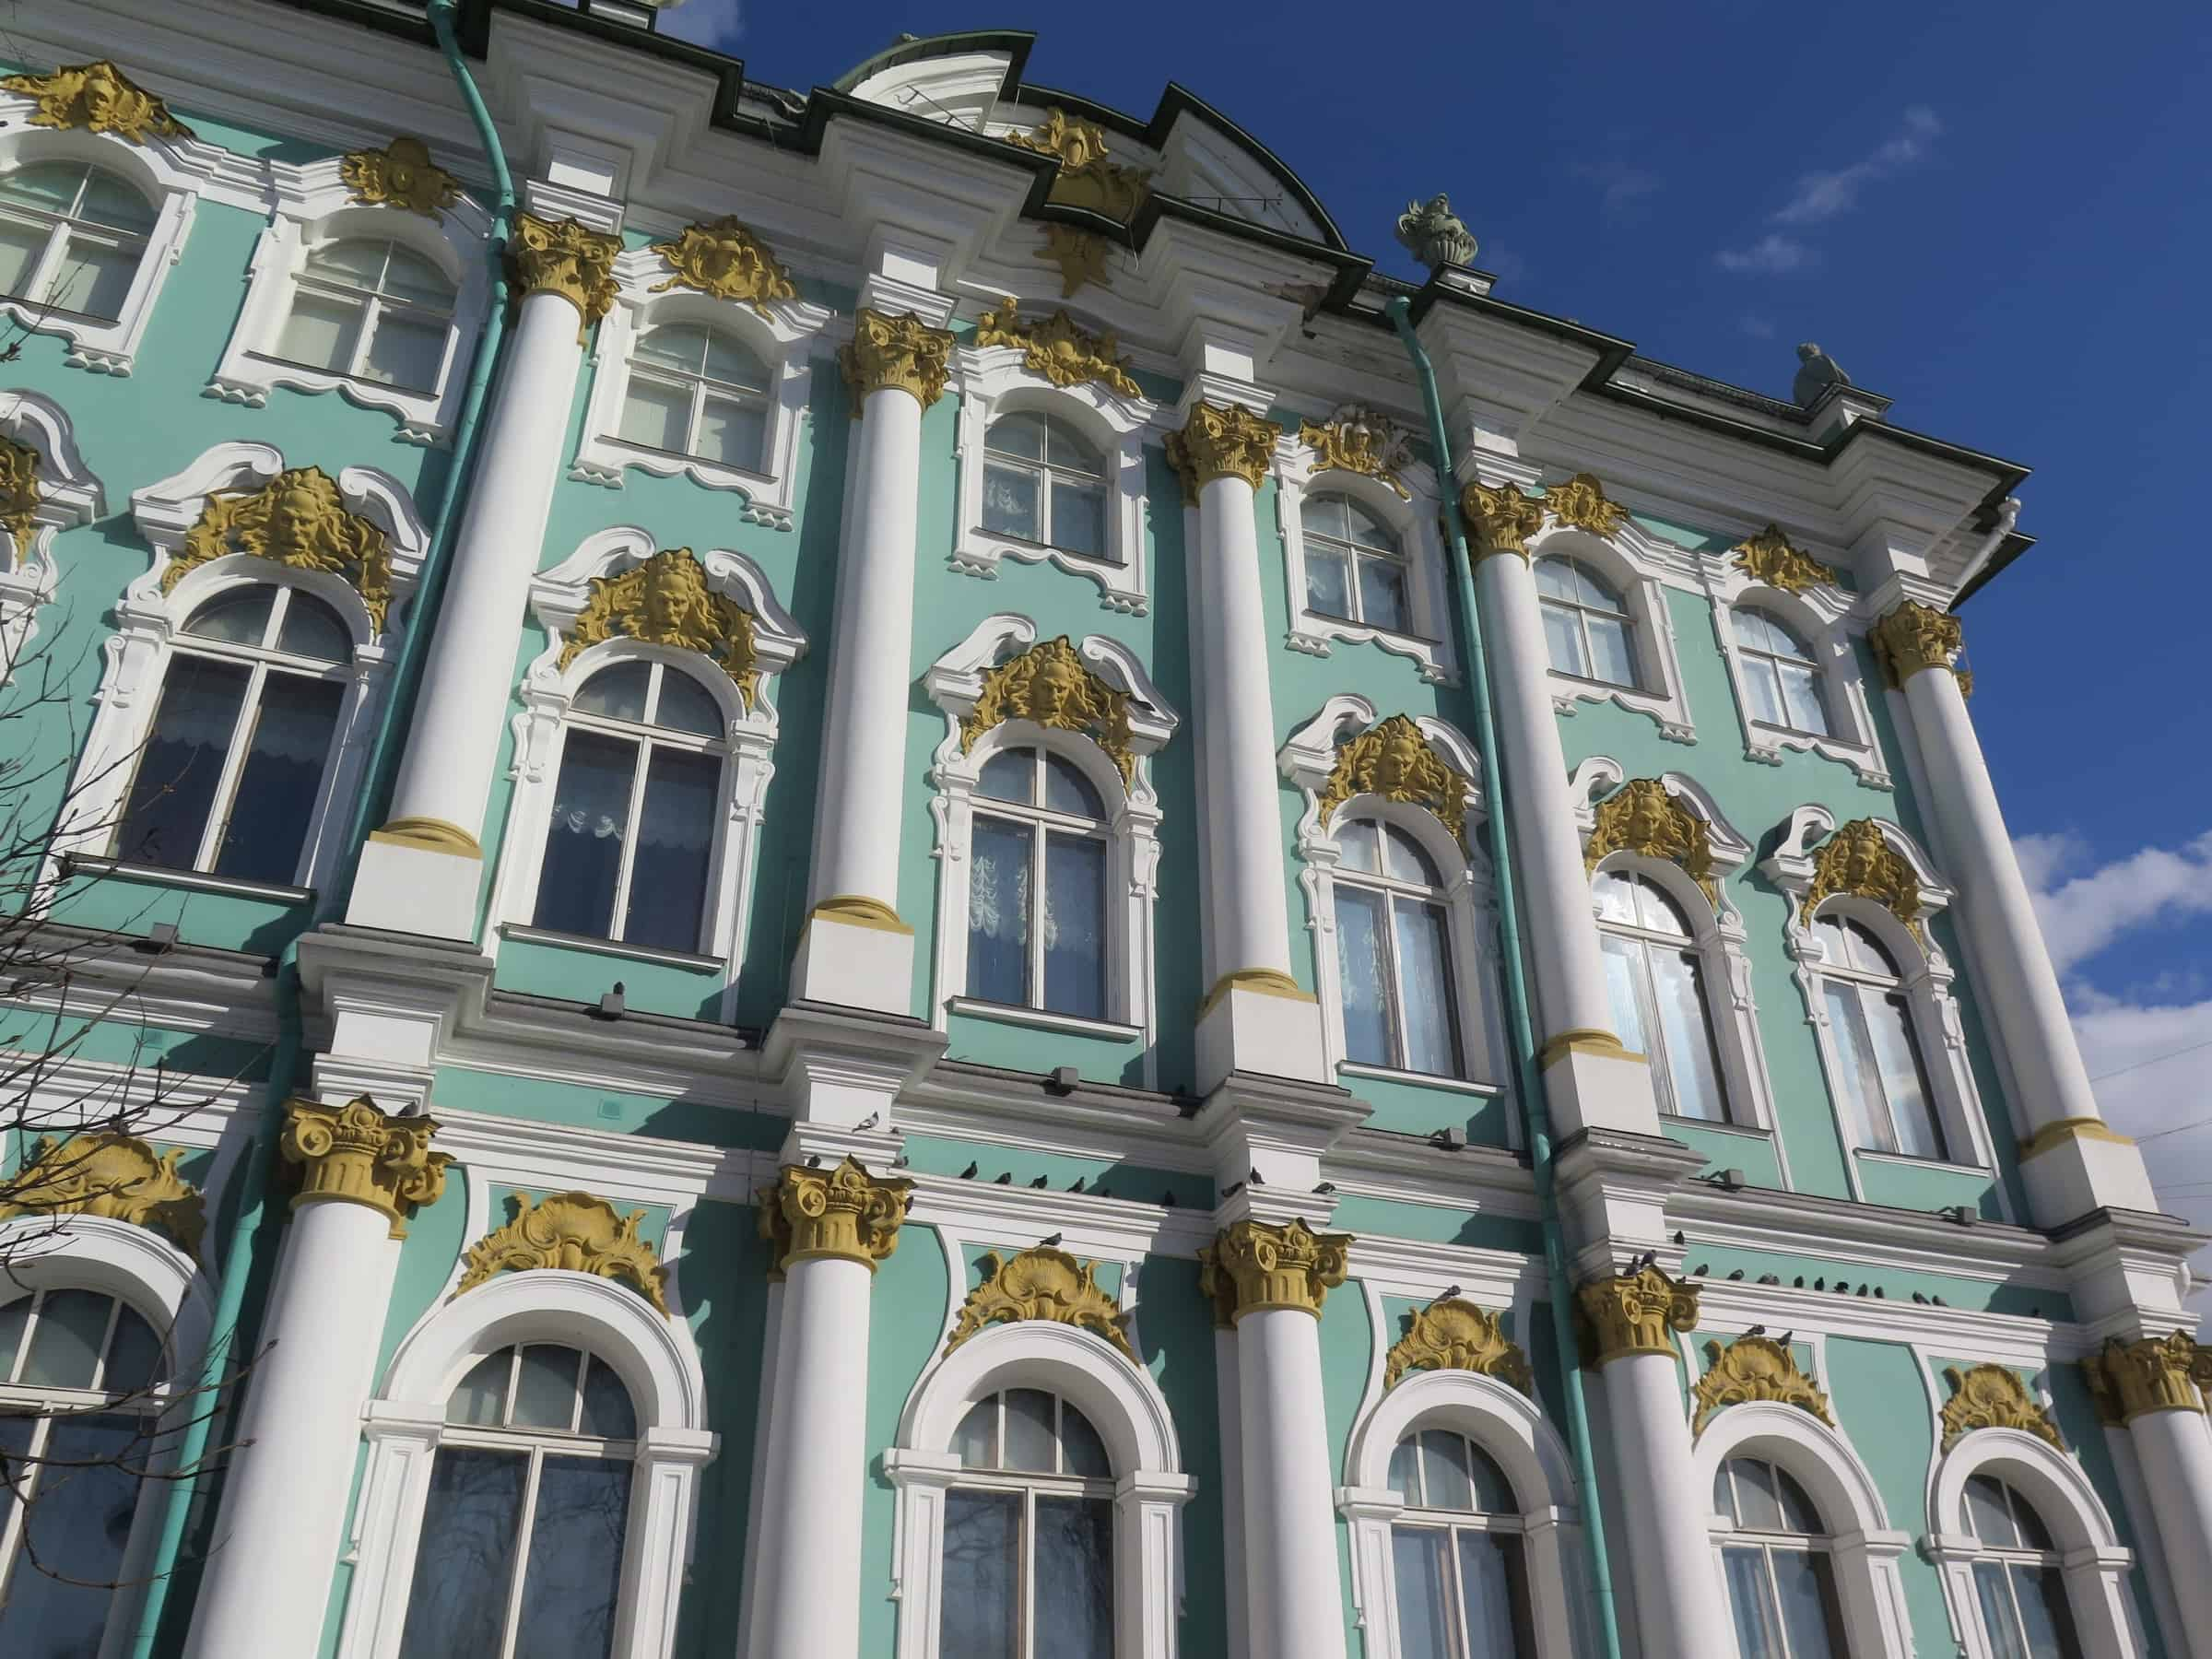 Windows of the Winter Palace